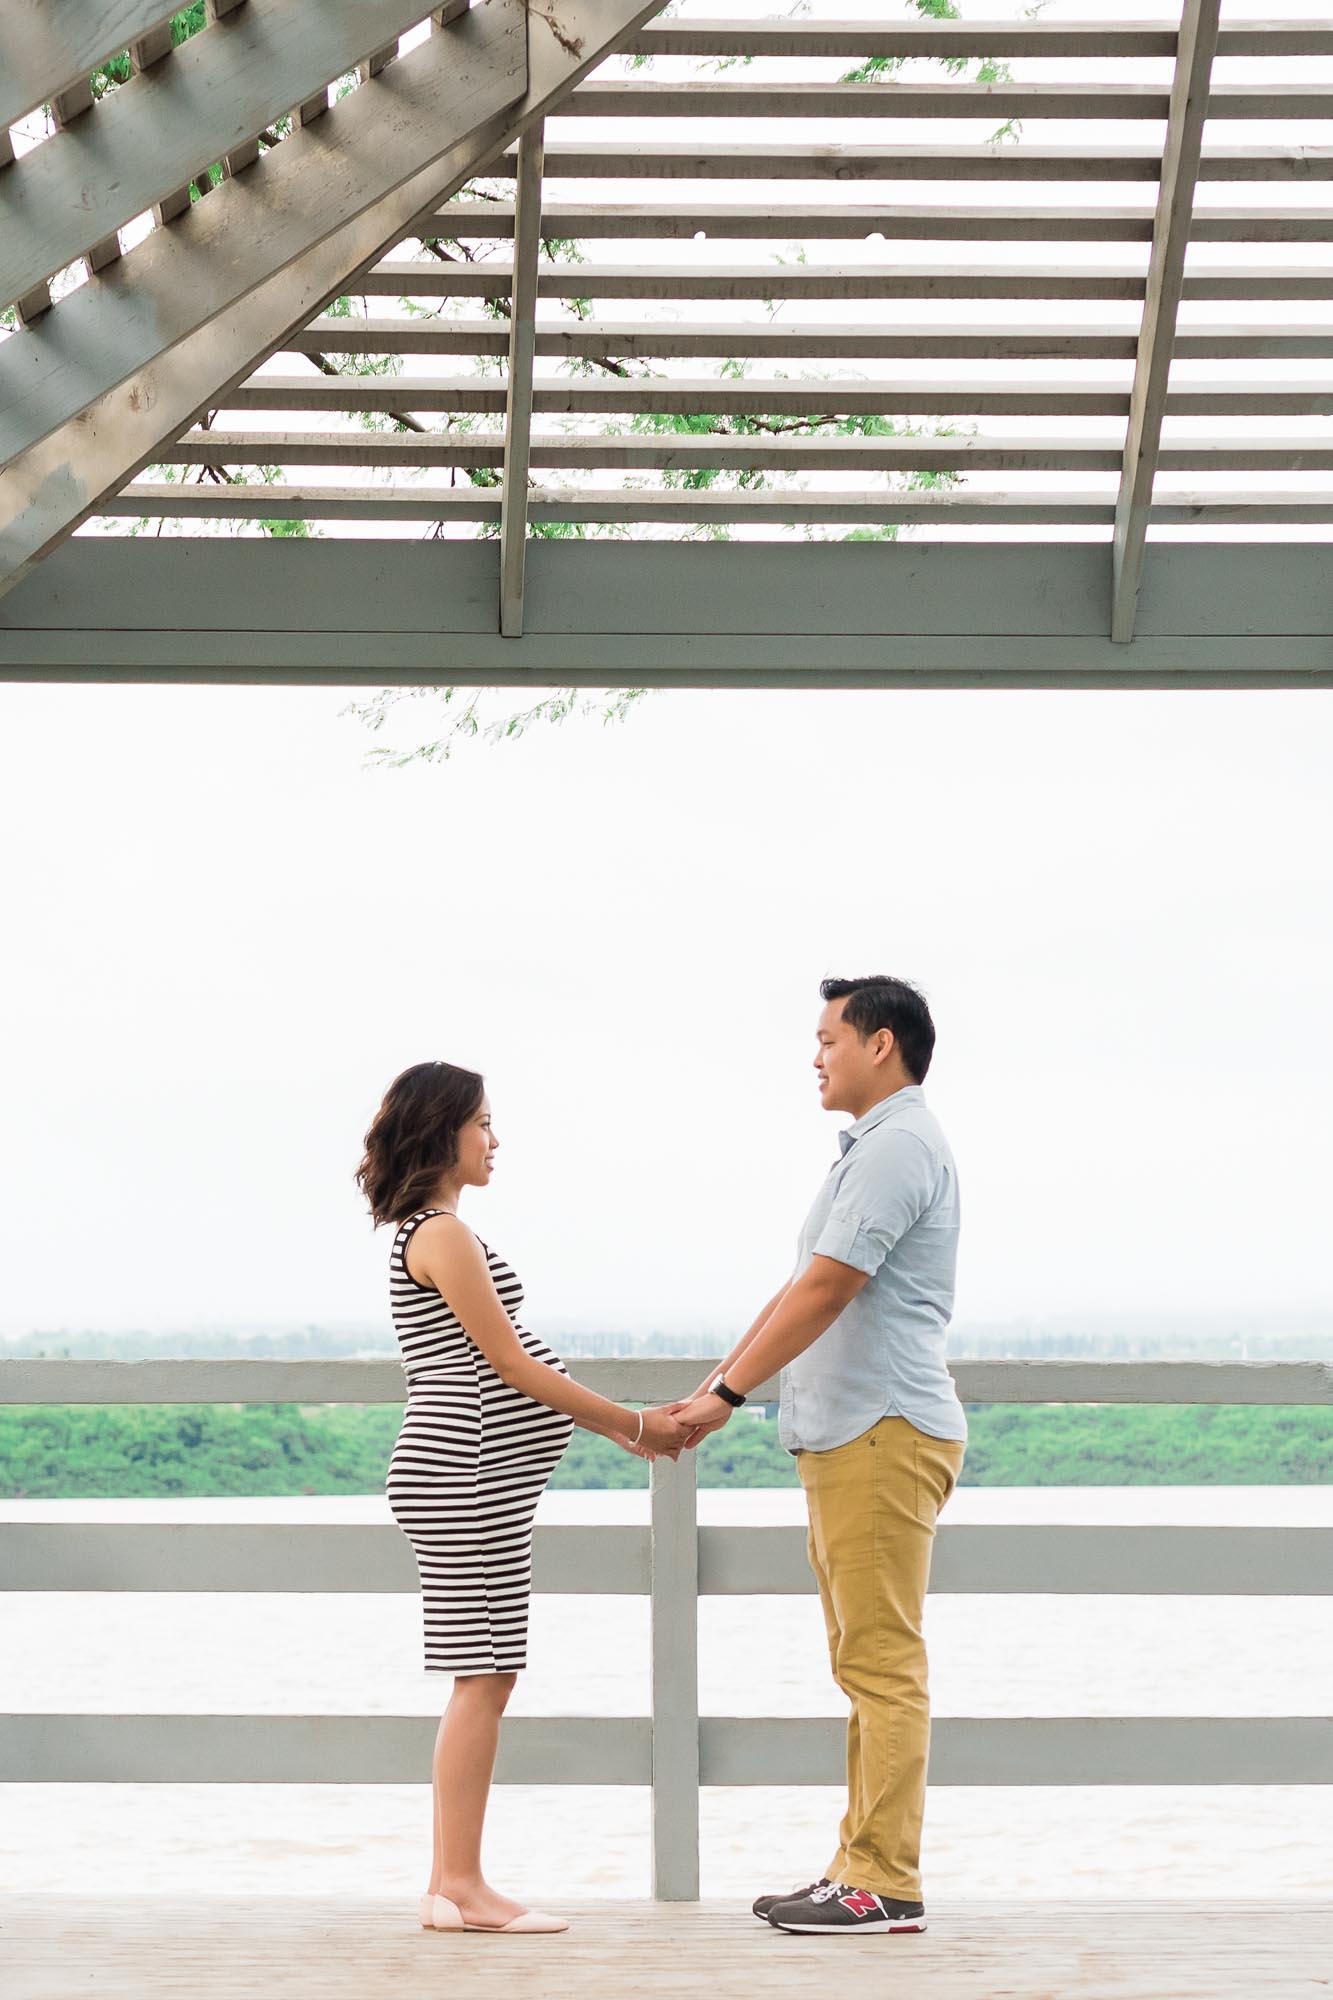 Oahu Maternity Photographer | Ewa Beach Maternity Session